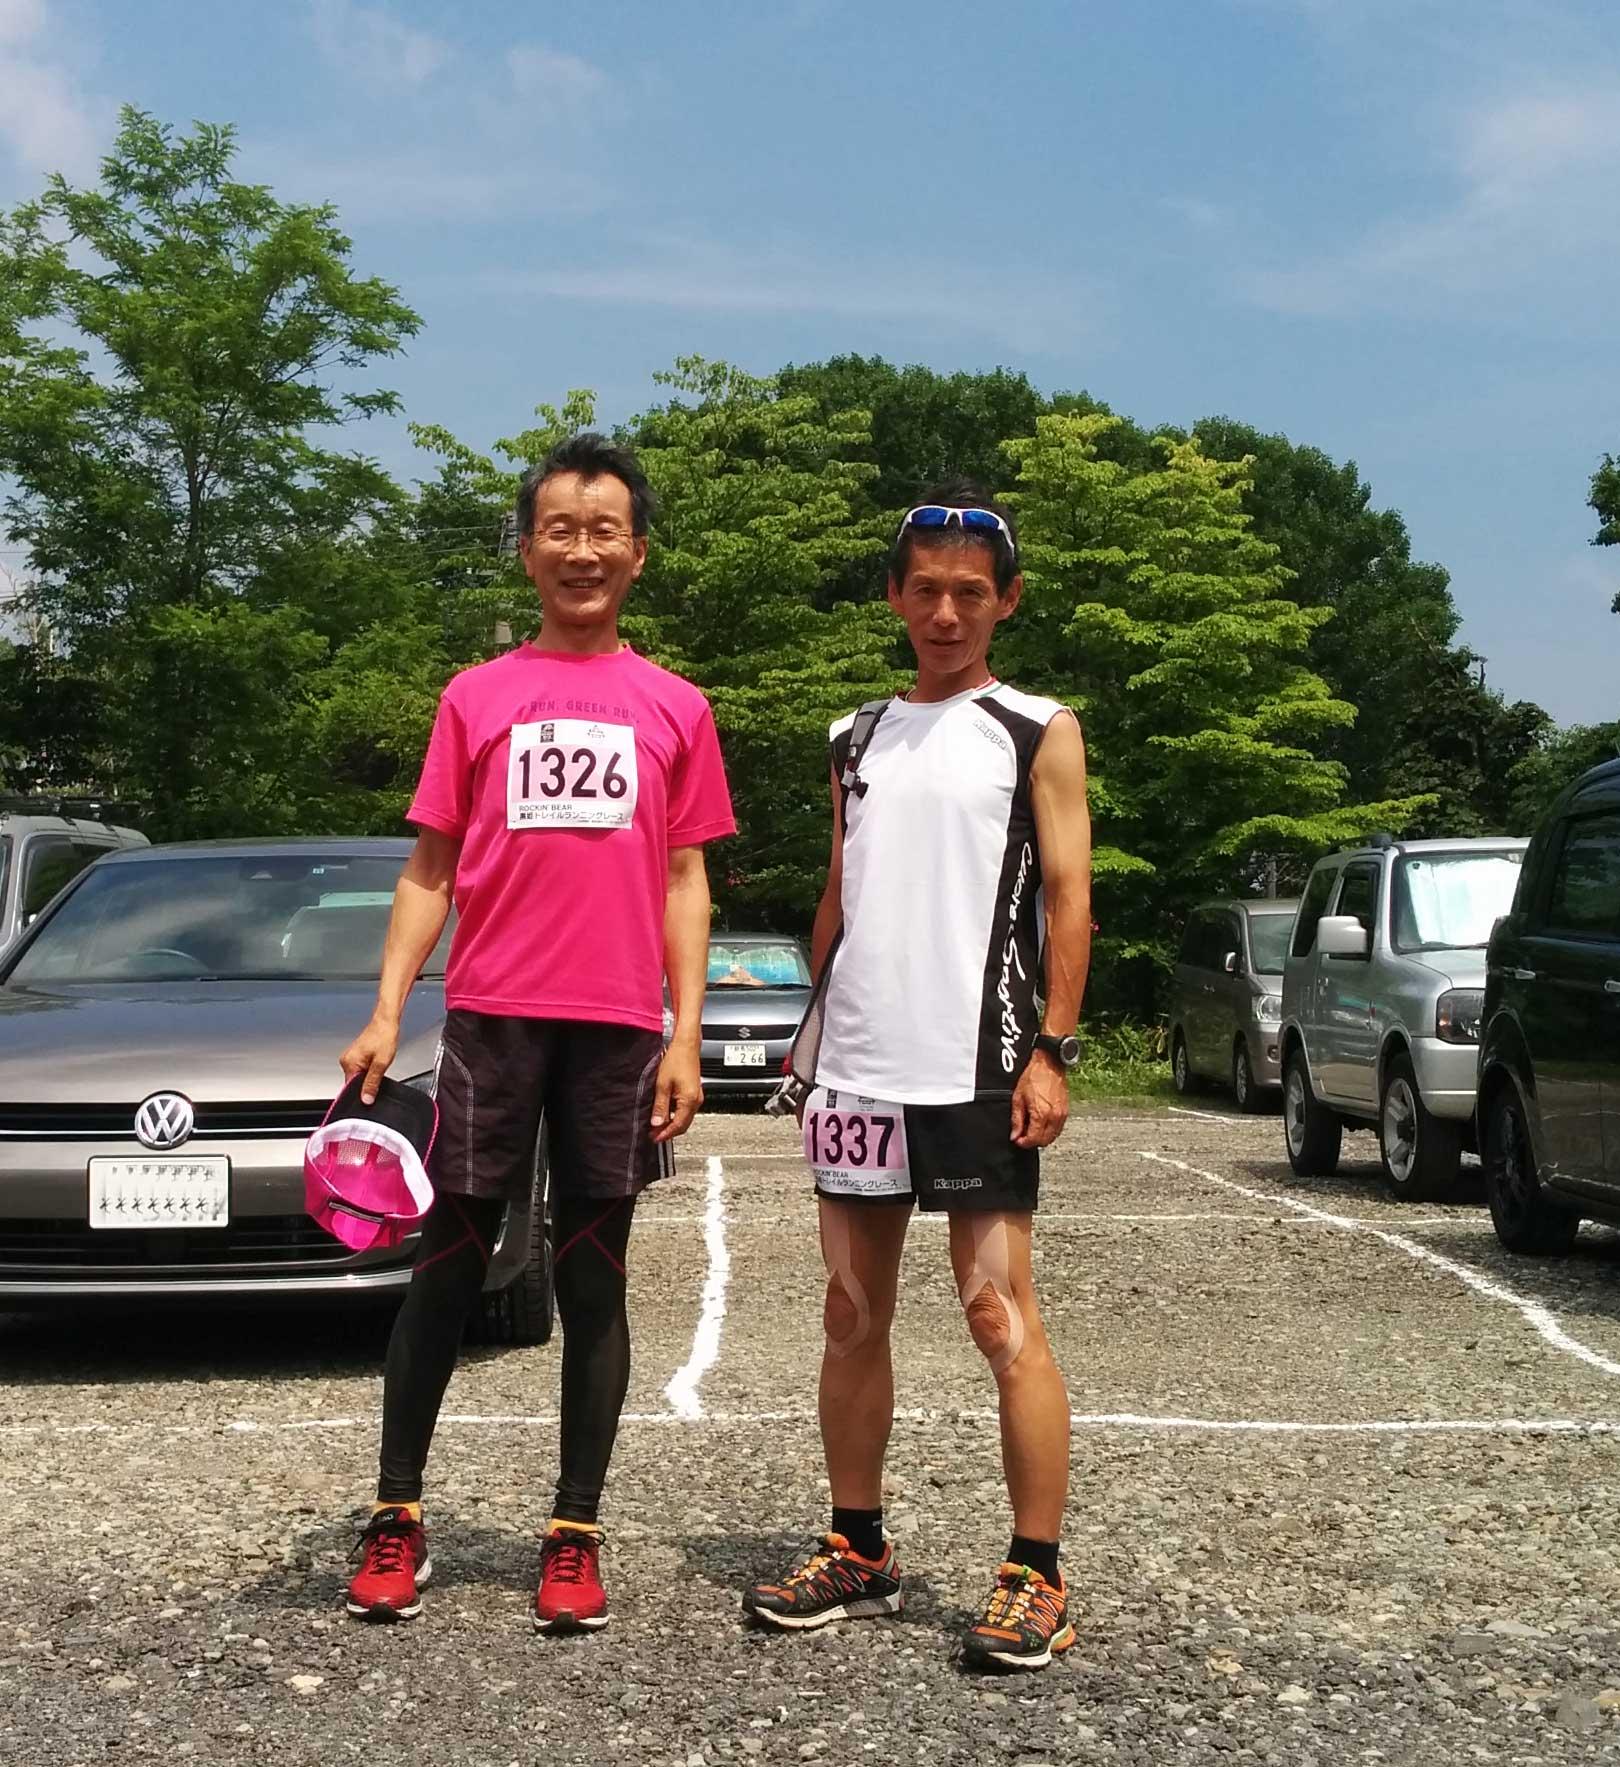 http://blog.murachan2003.com/images/hutari2016618.jpg